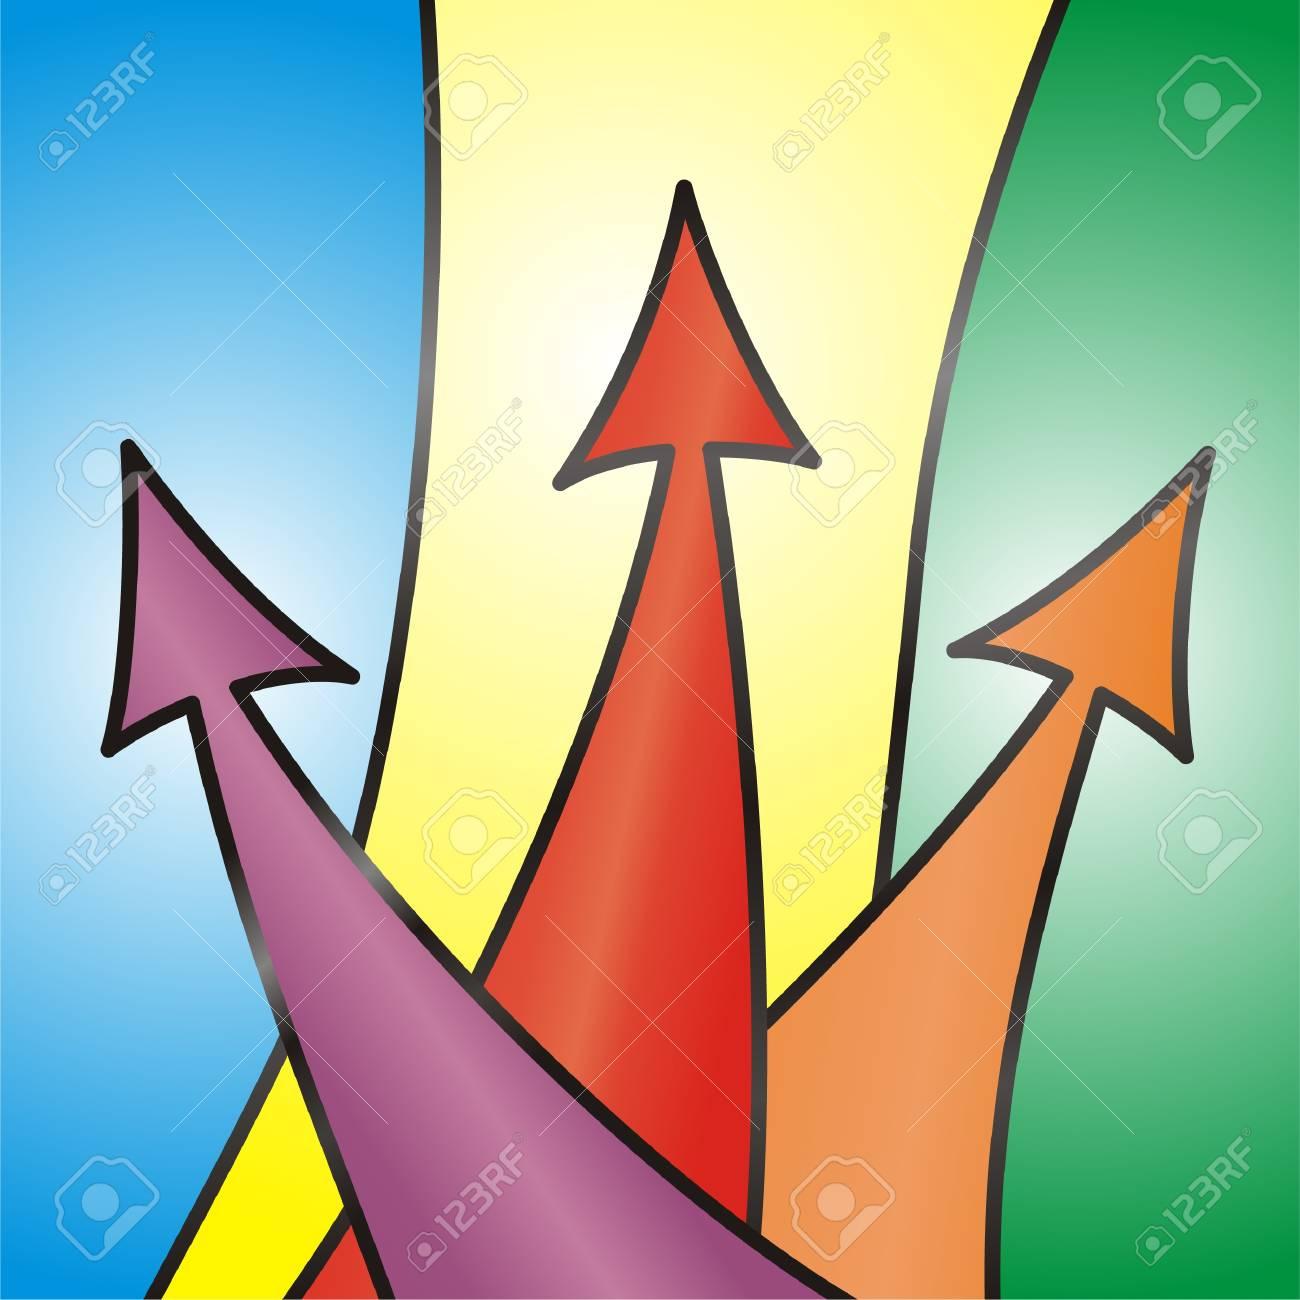 Abstract Arrow Background. Vector illustration. Stock Vector - 14782236